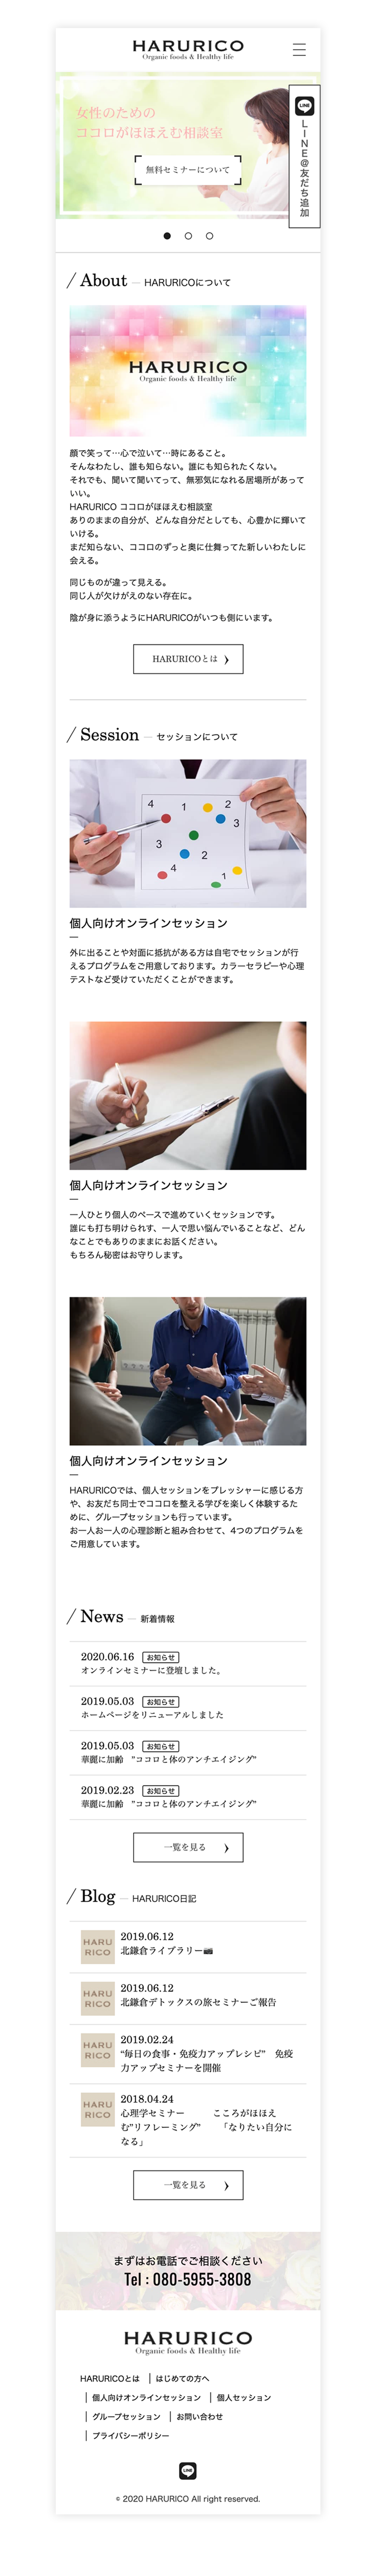 HARURICO サービス紹介サイト